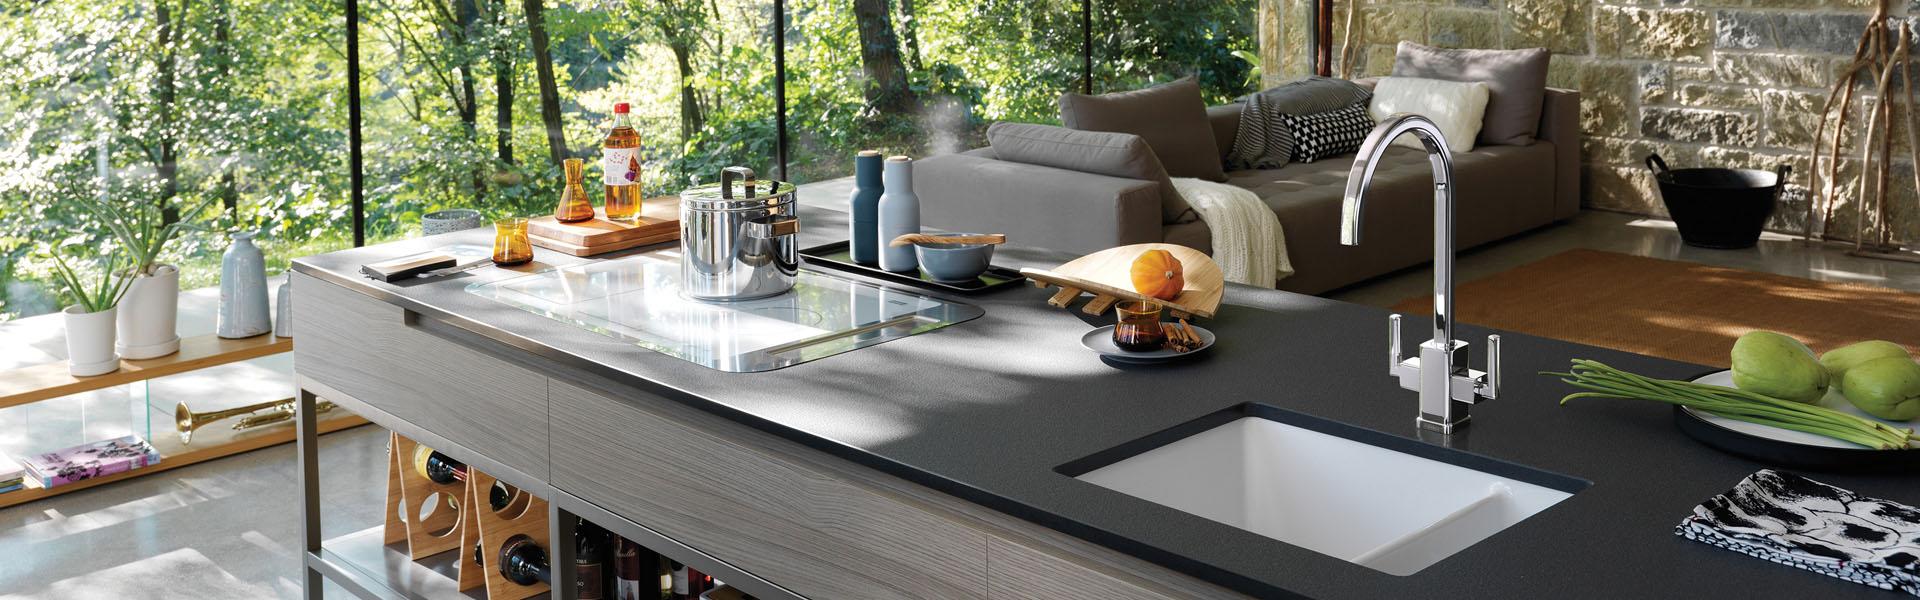 The Gallery - Appliances Franke Kubus